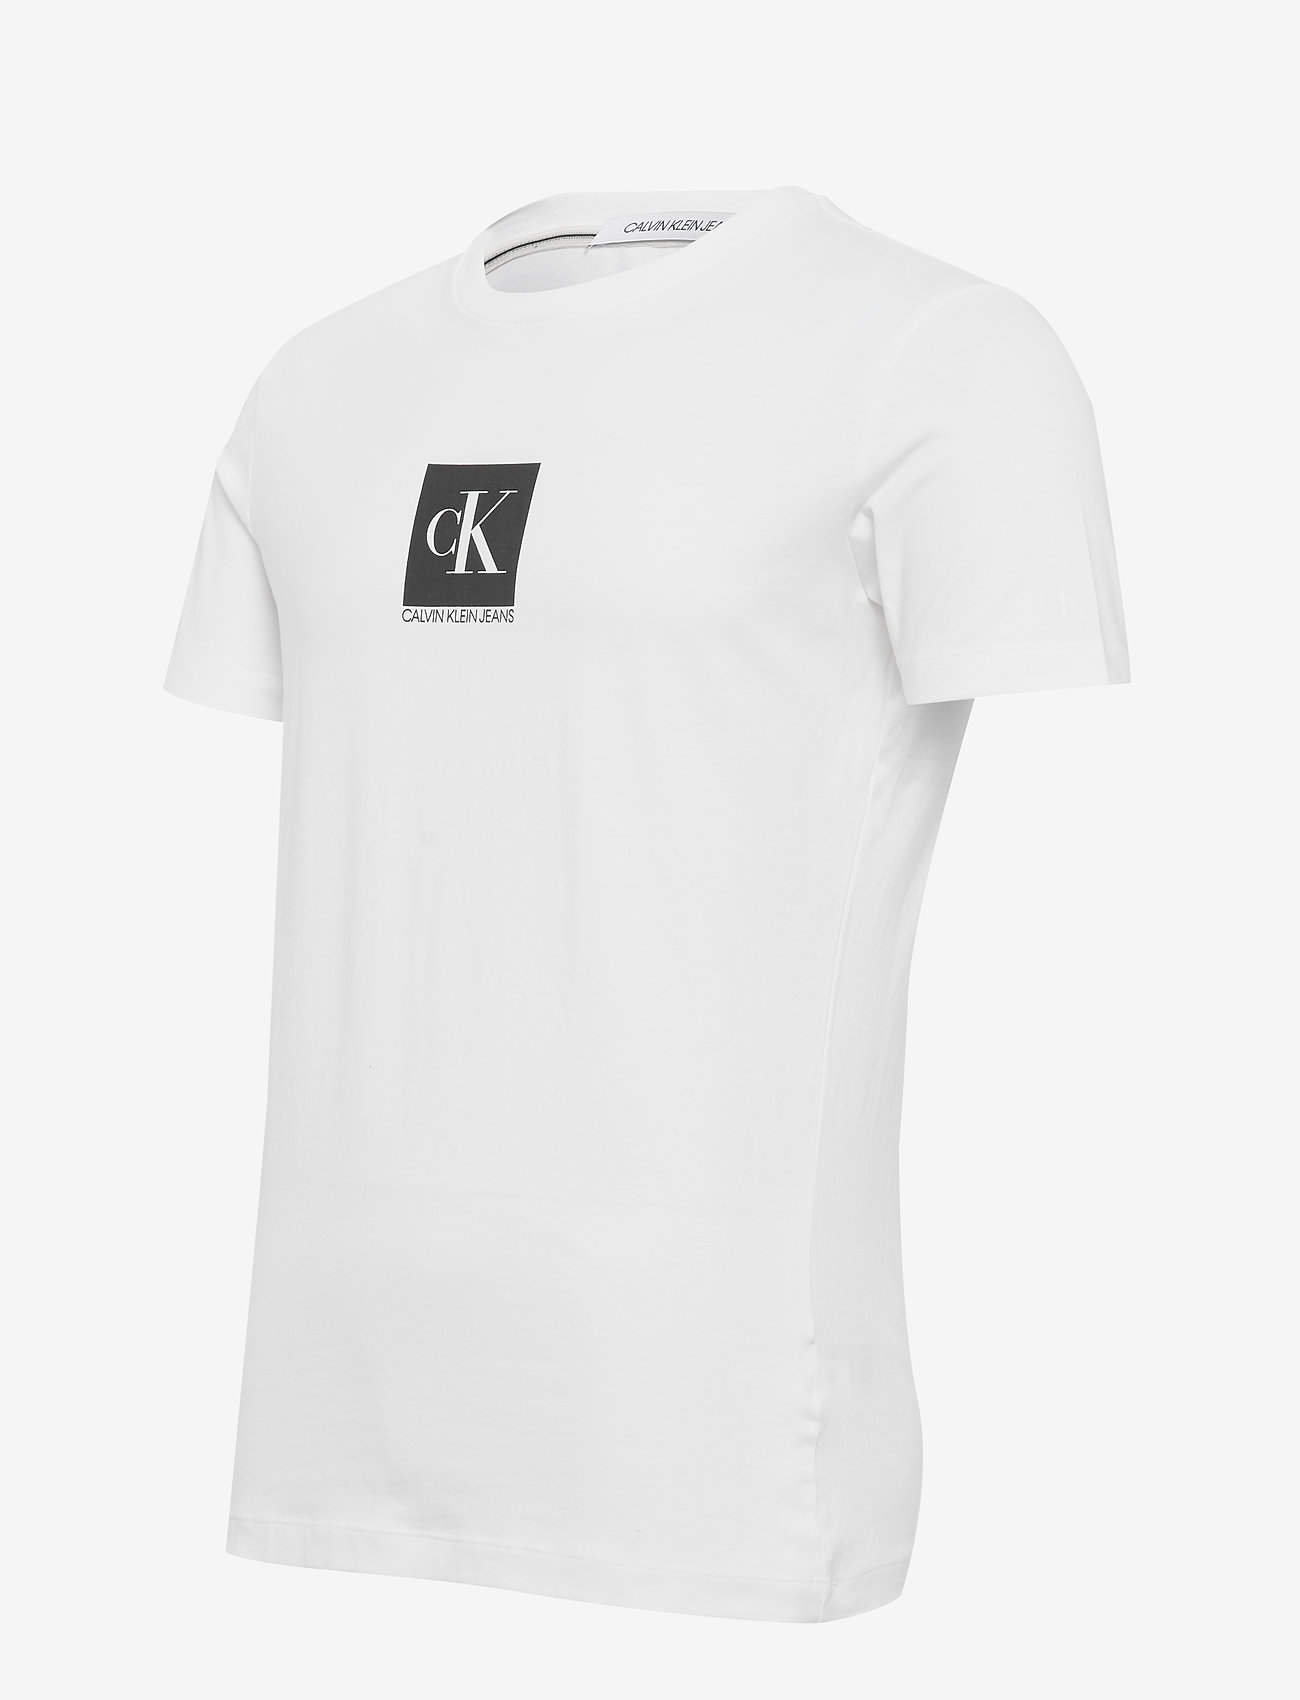 Center Monogram Box Slim Tee (Bright White) (280 kr) - Calvin Klein Jeans